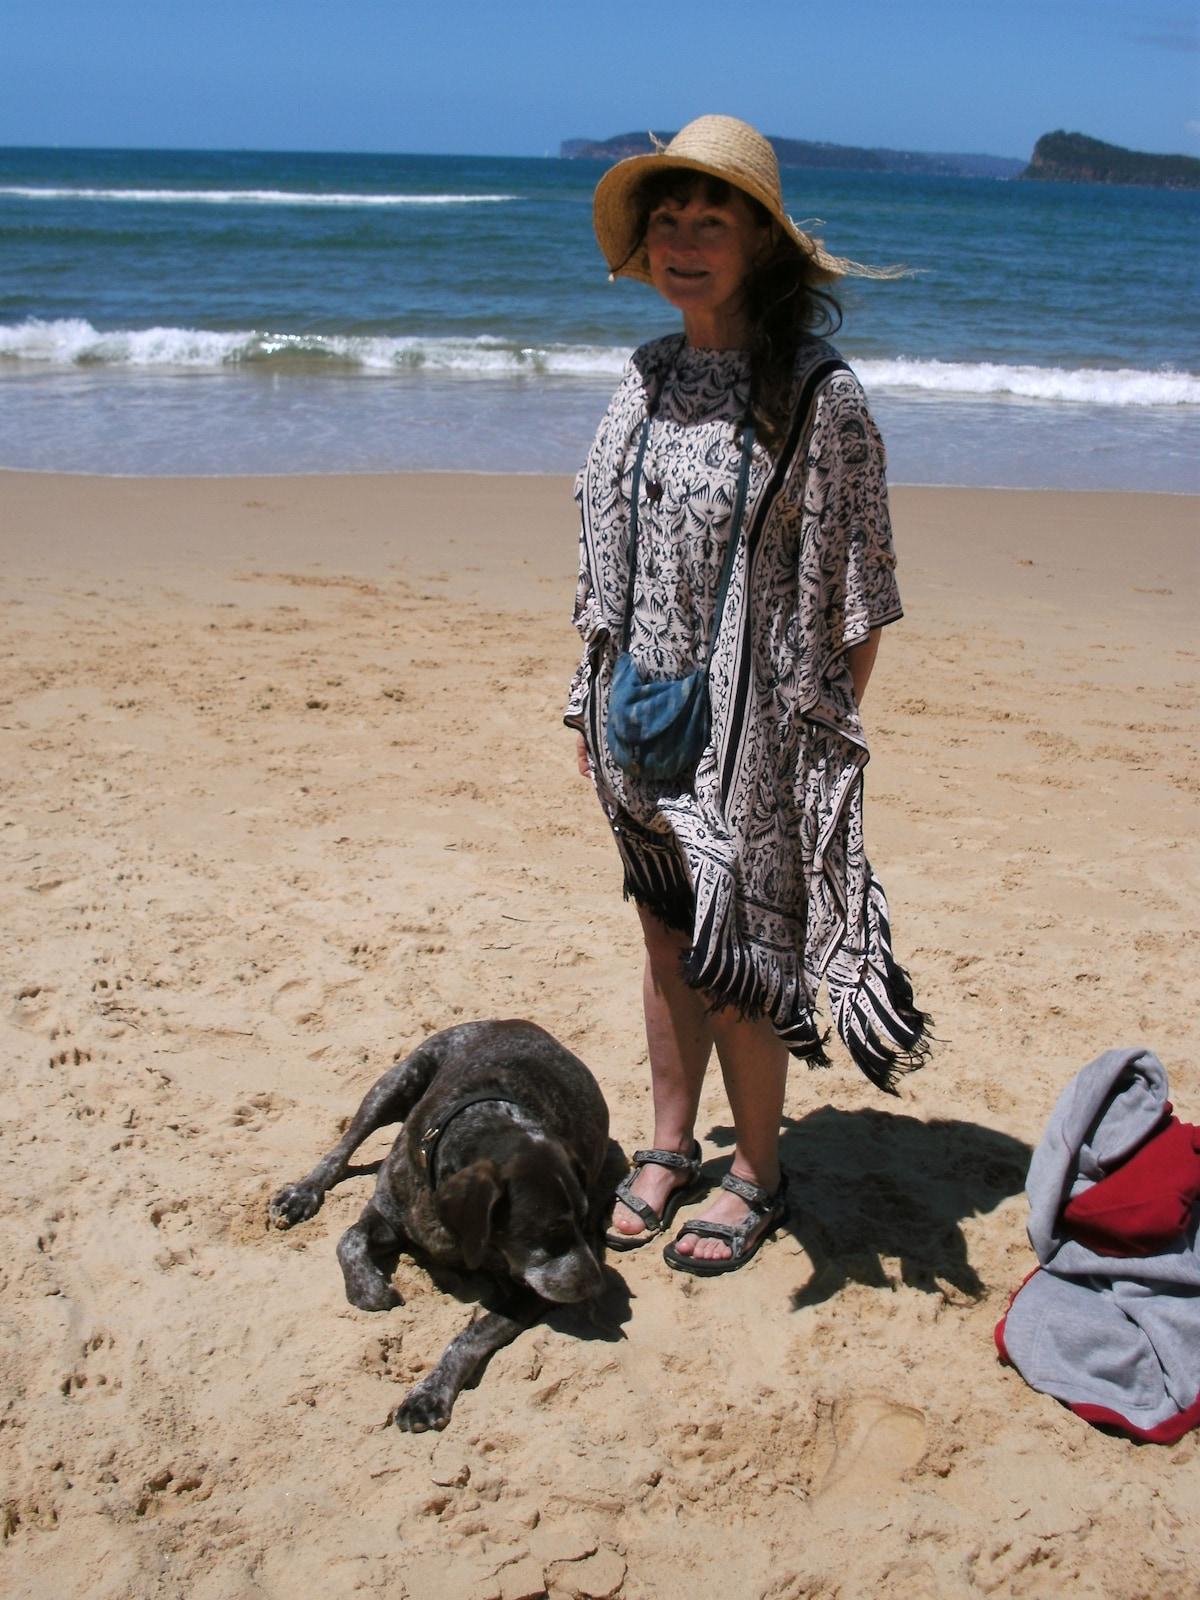 Sue From Sydney, Australia